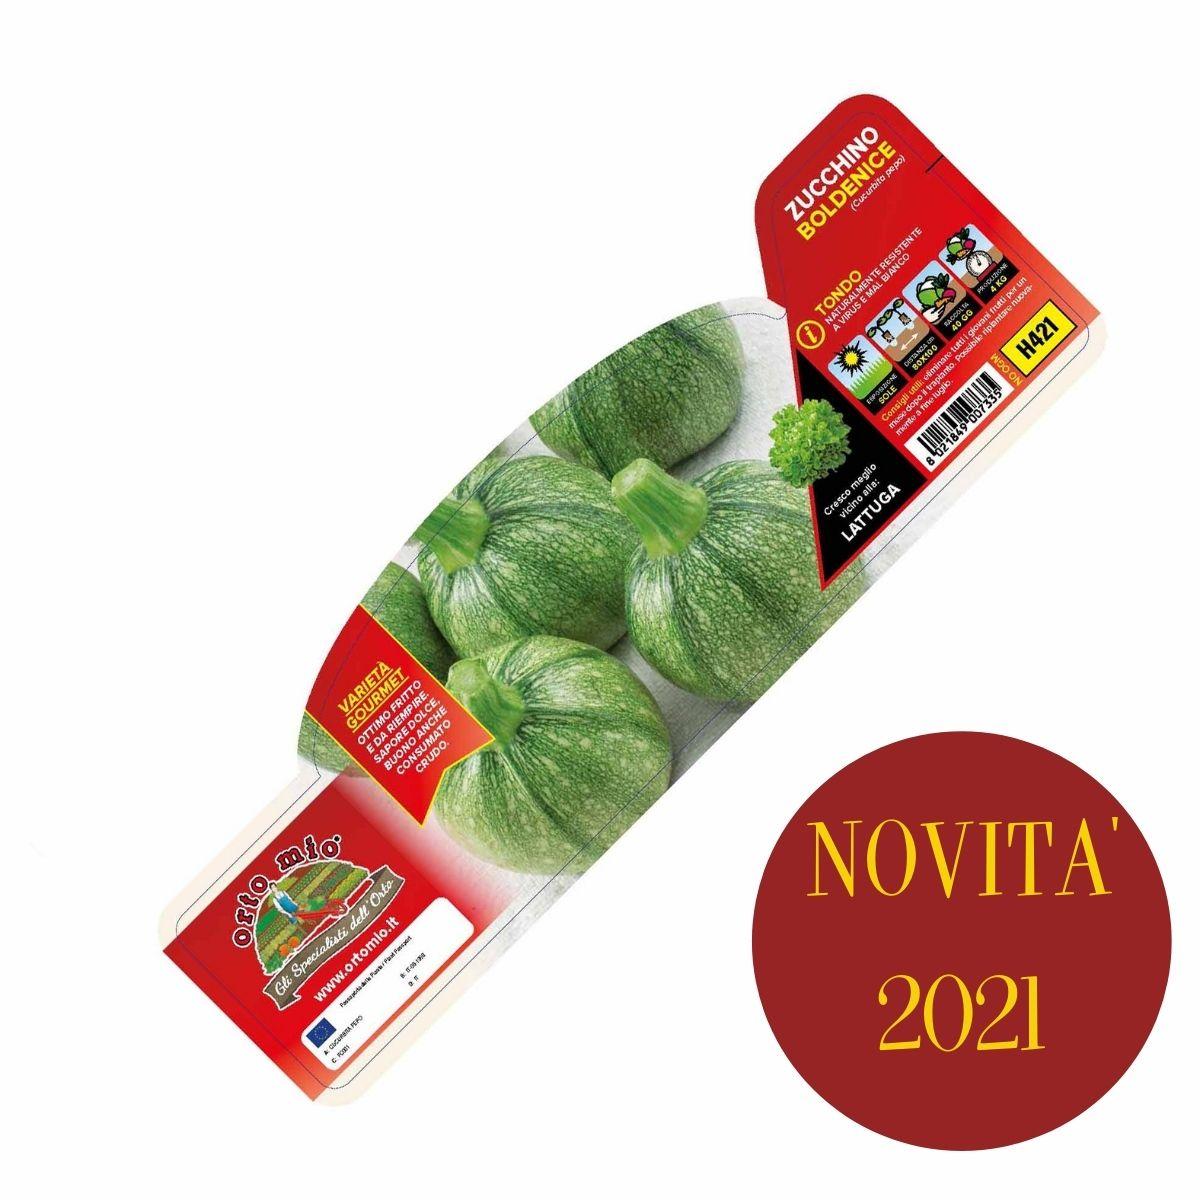 Zucchino Tondo var. Boldenice F1- Rondo F1